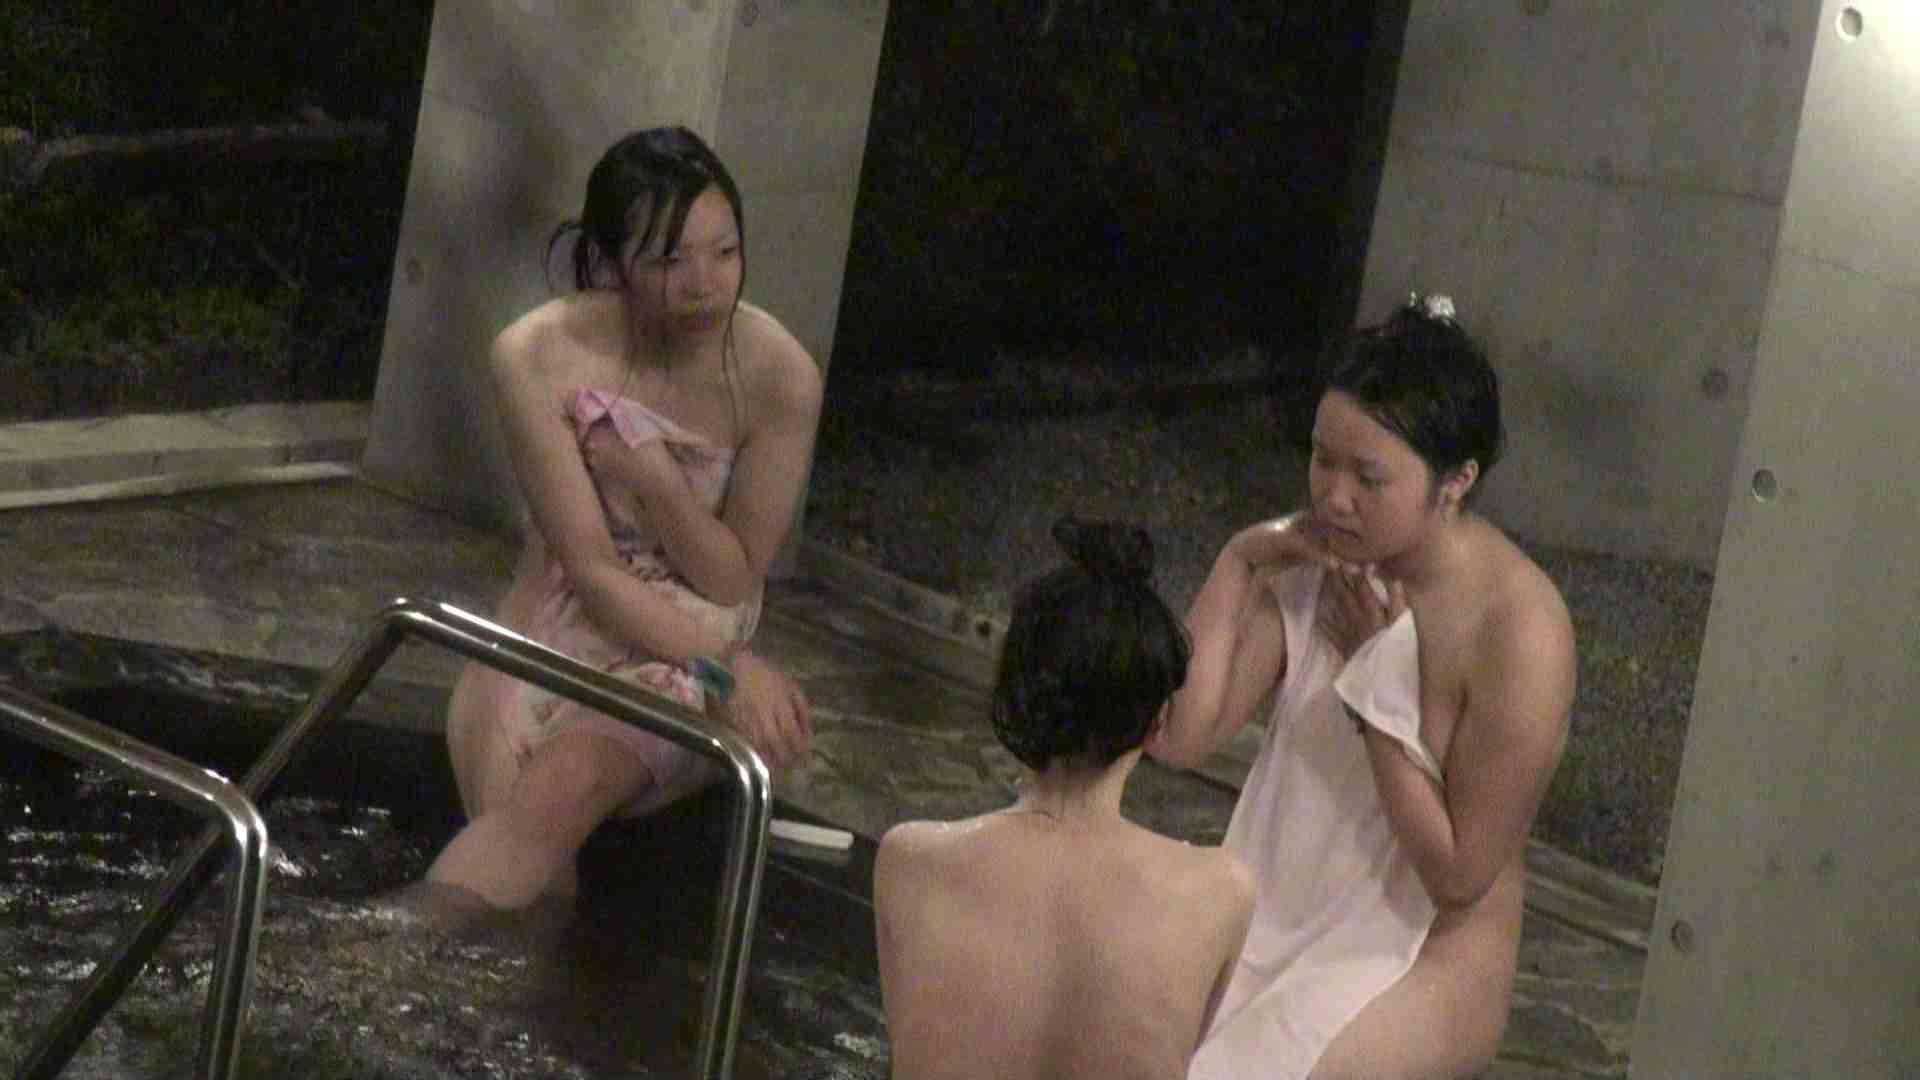 Aquaな露天風呂Vol.383 OLセックス 覗き性交動画流出 103画像 56